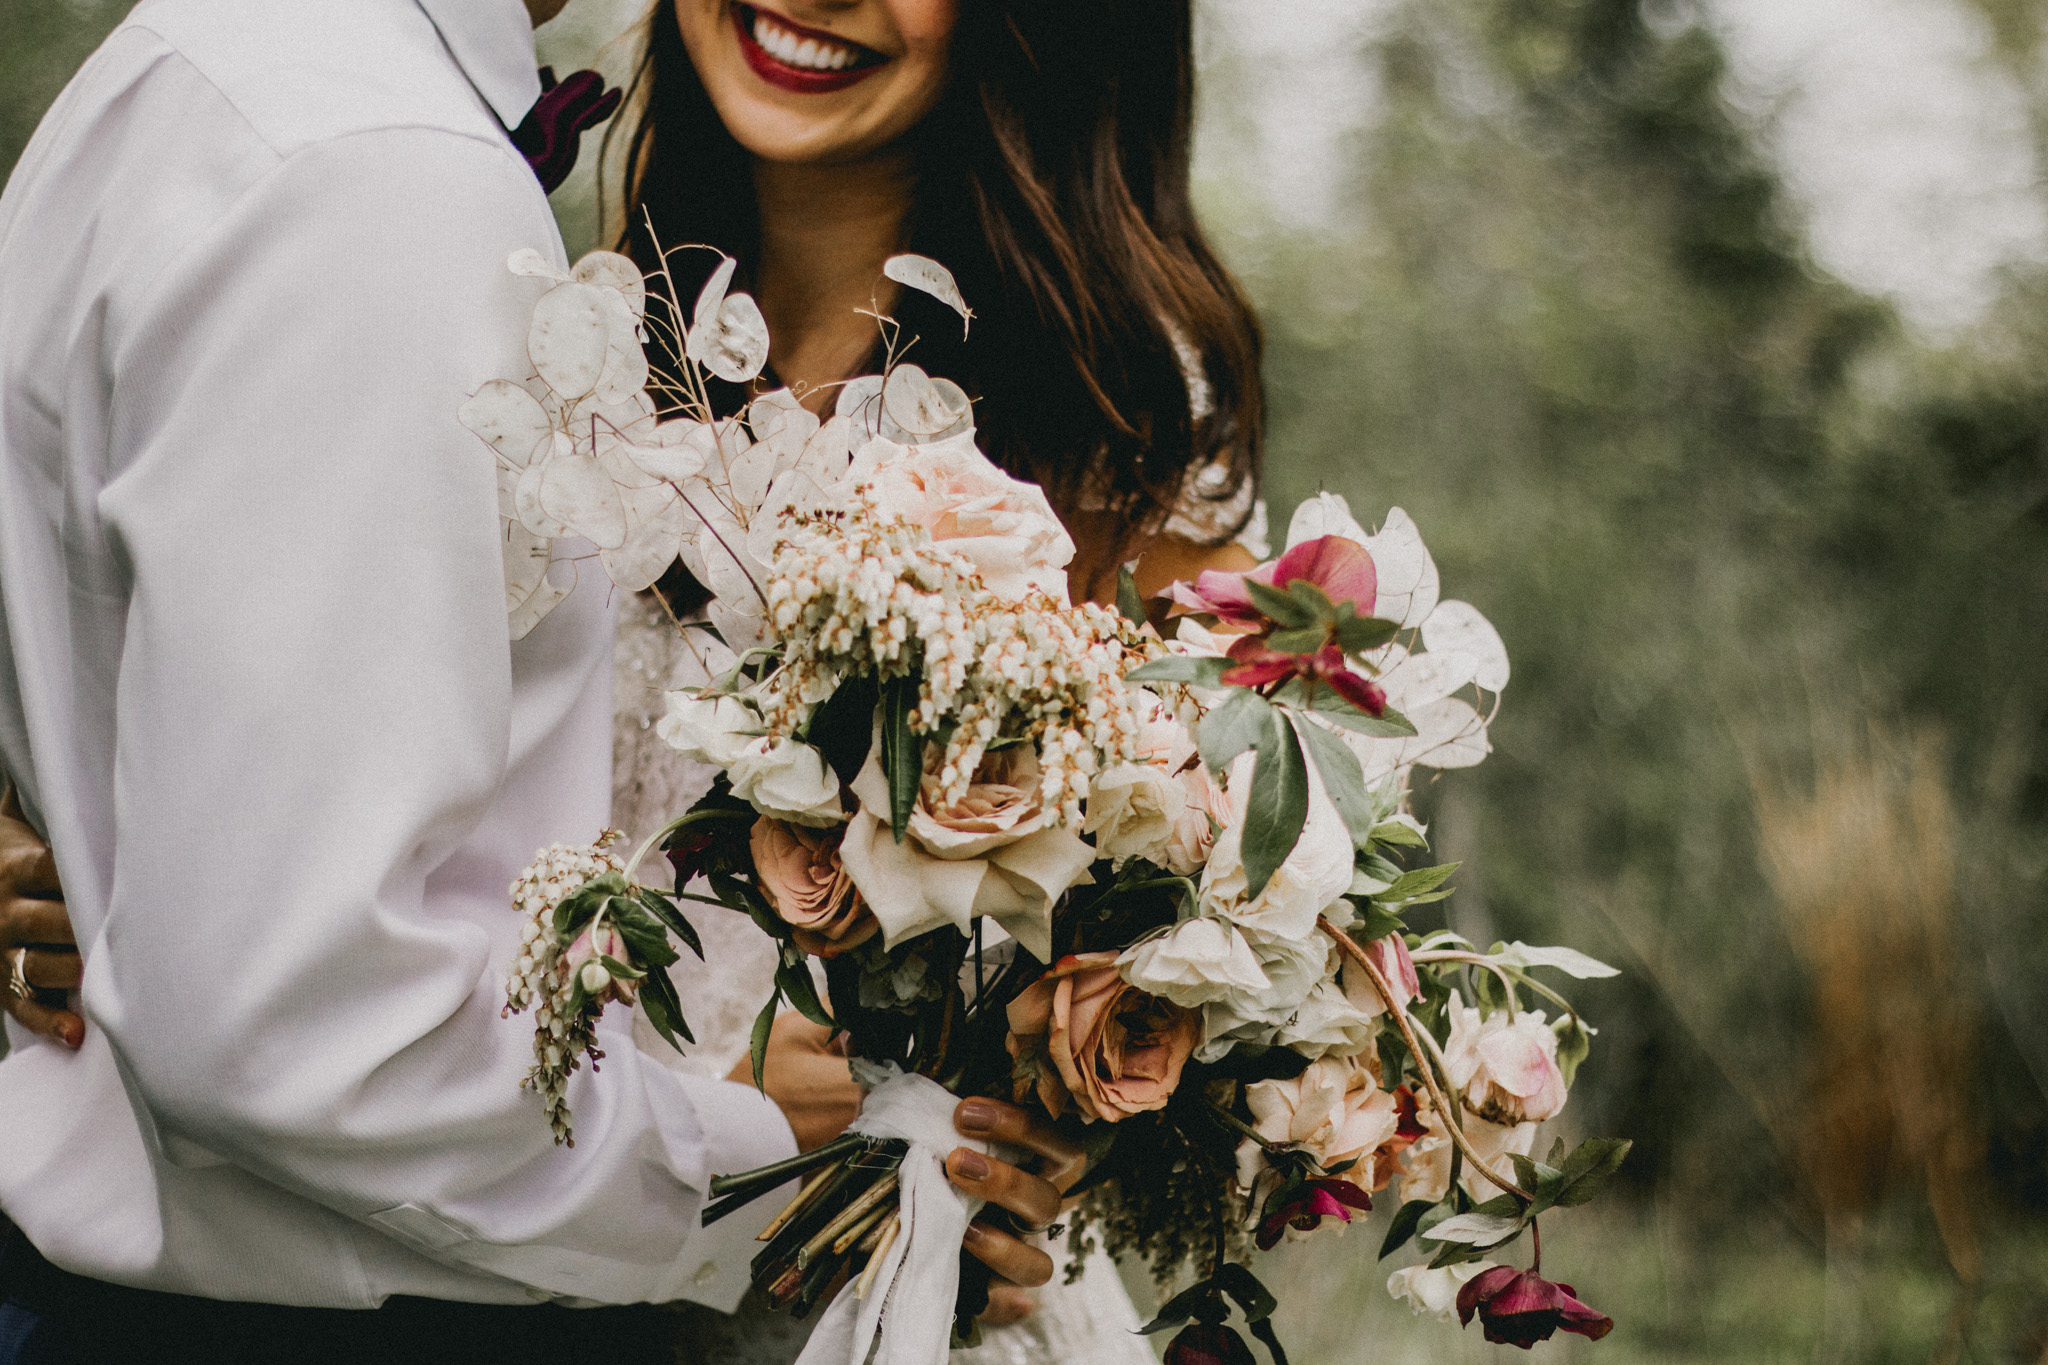 Breshears After Bridal Session Blog-10.jpg